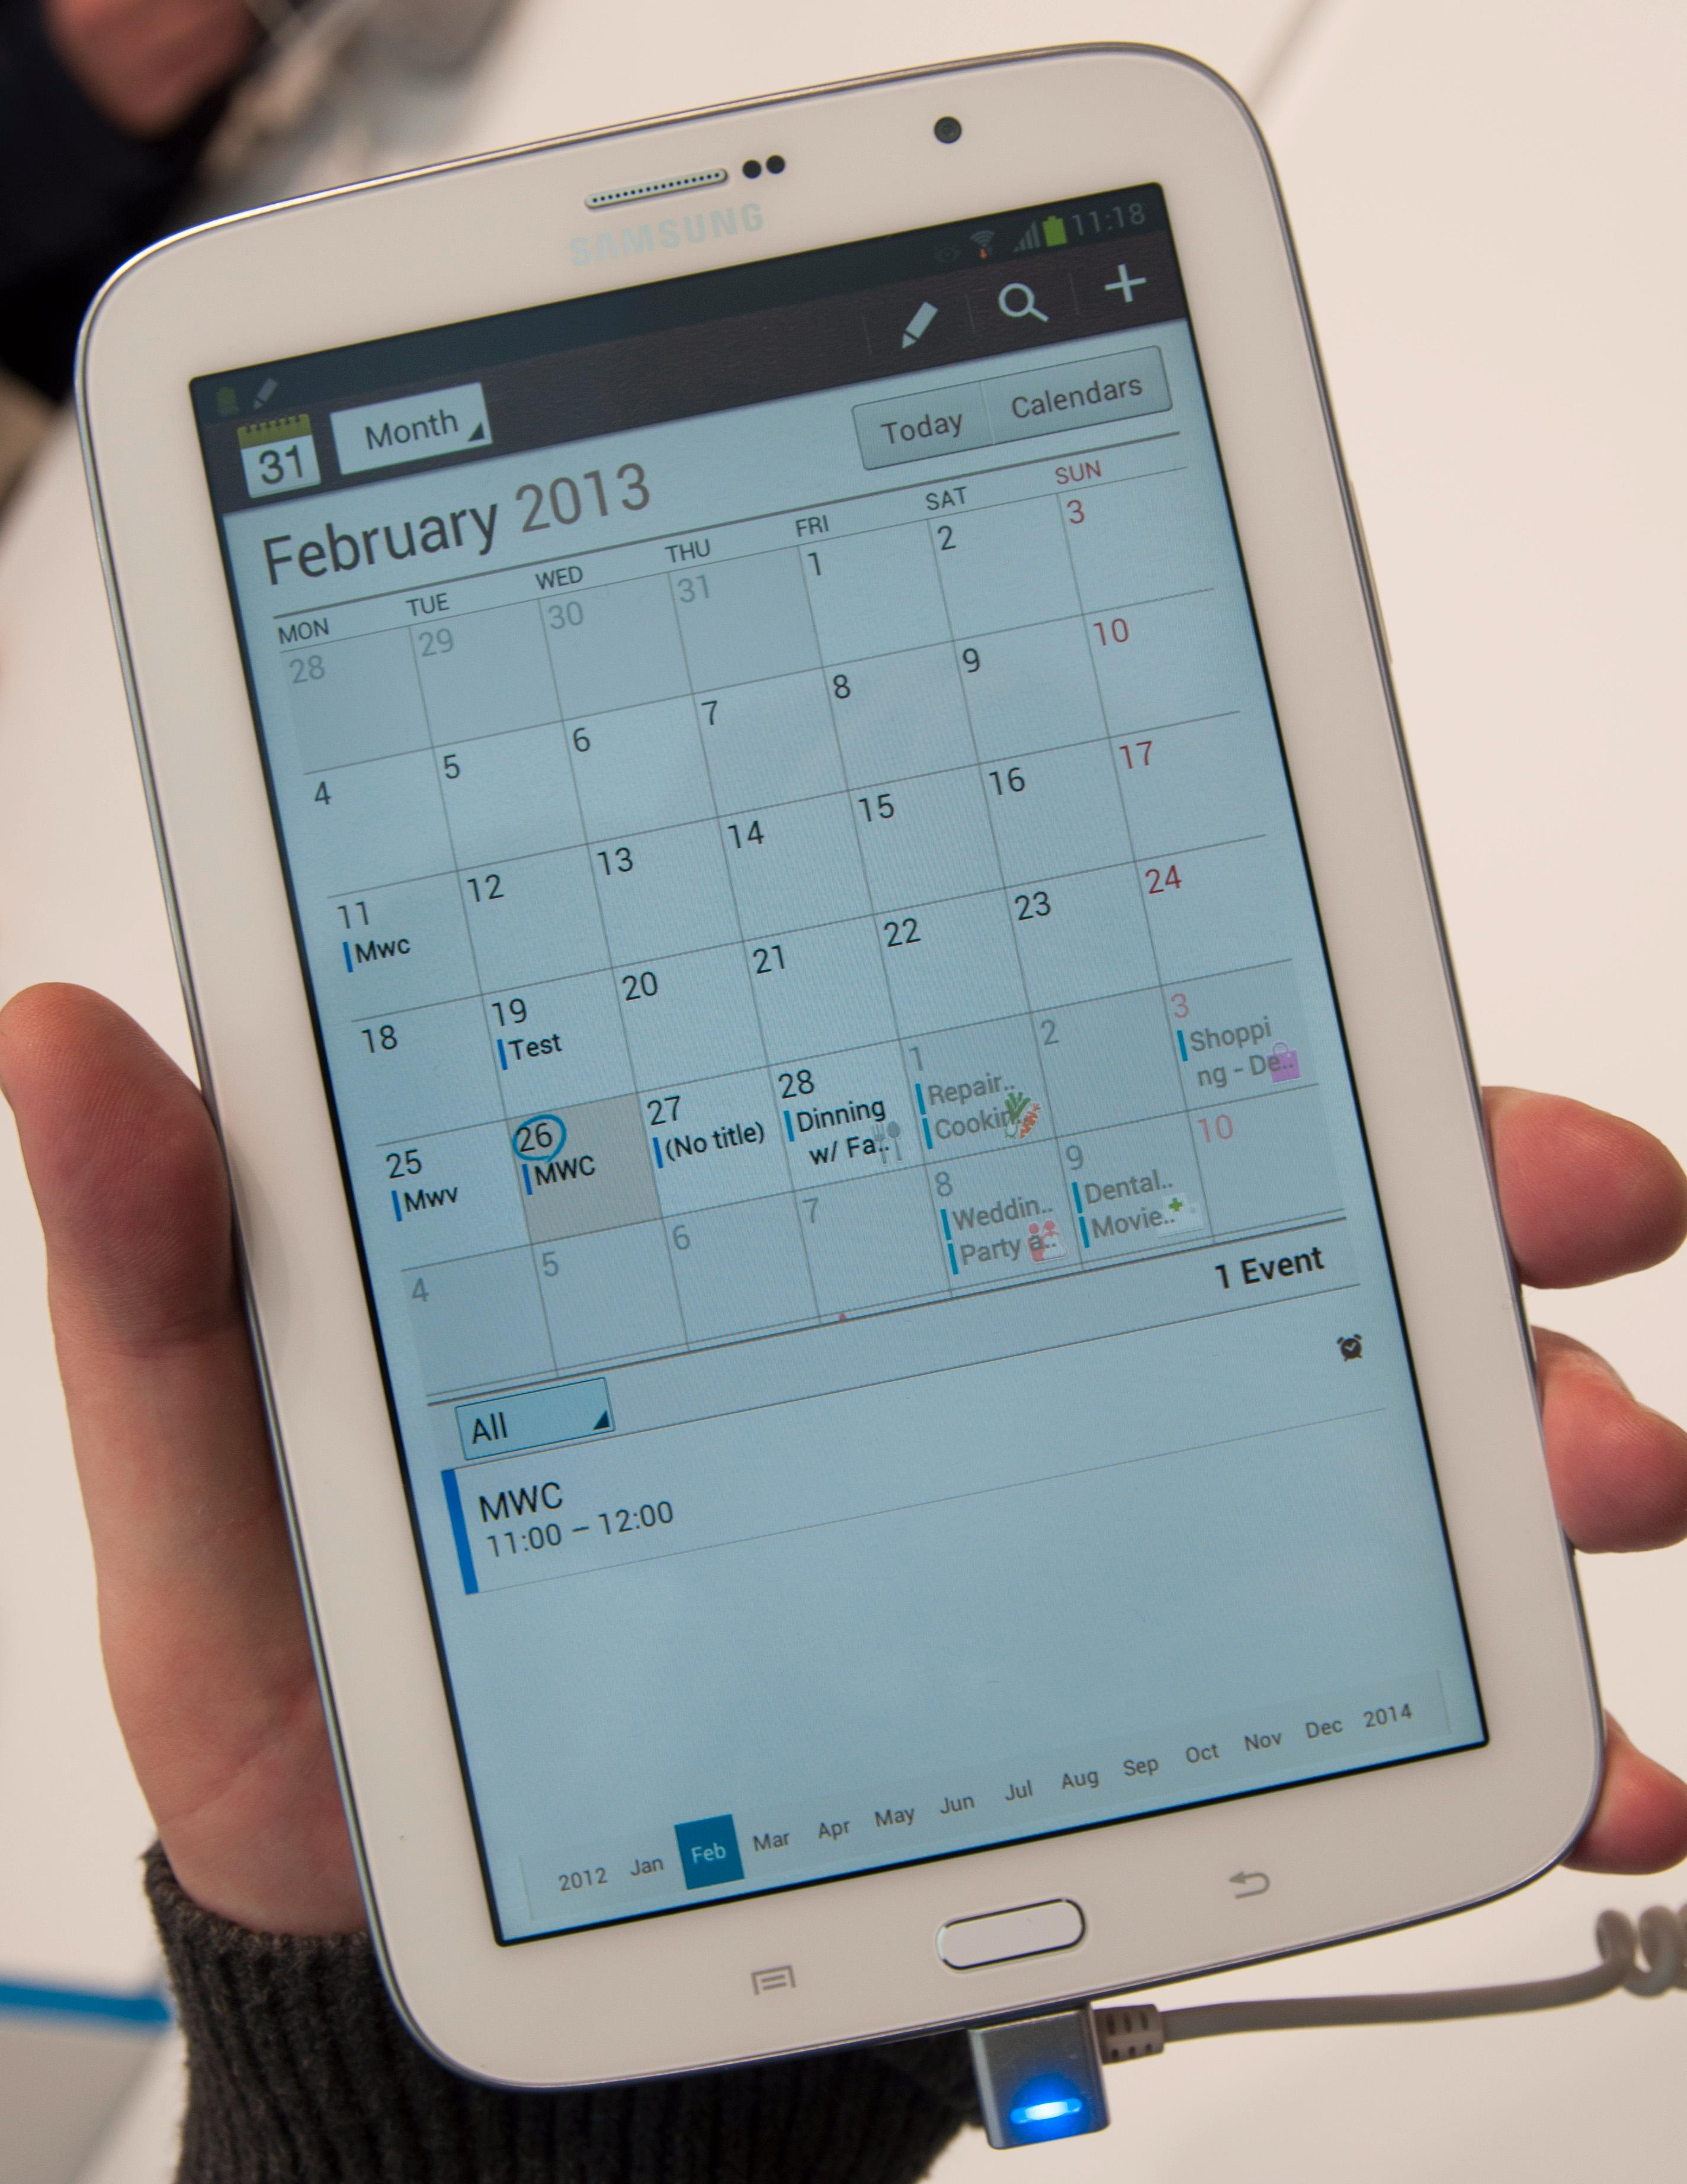 Slik ser kalender-appen ut.Foto: Finn Jarle Kvalheim, Amobil.no